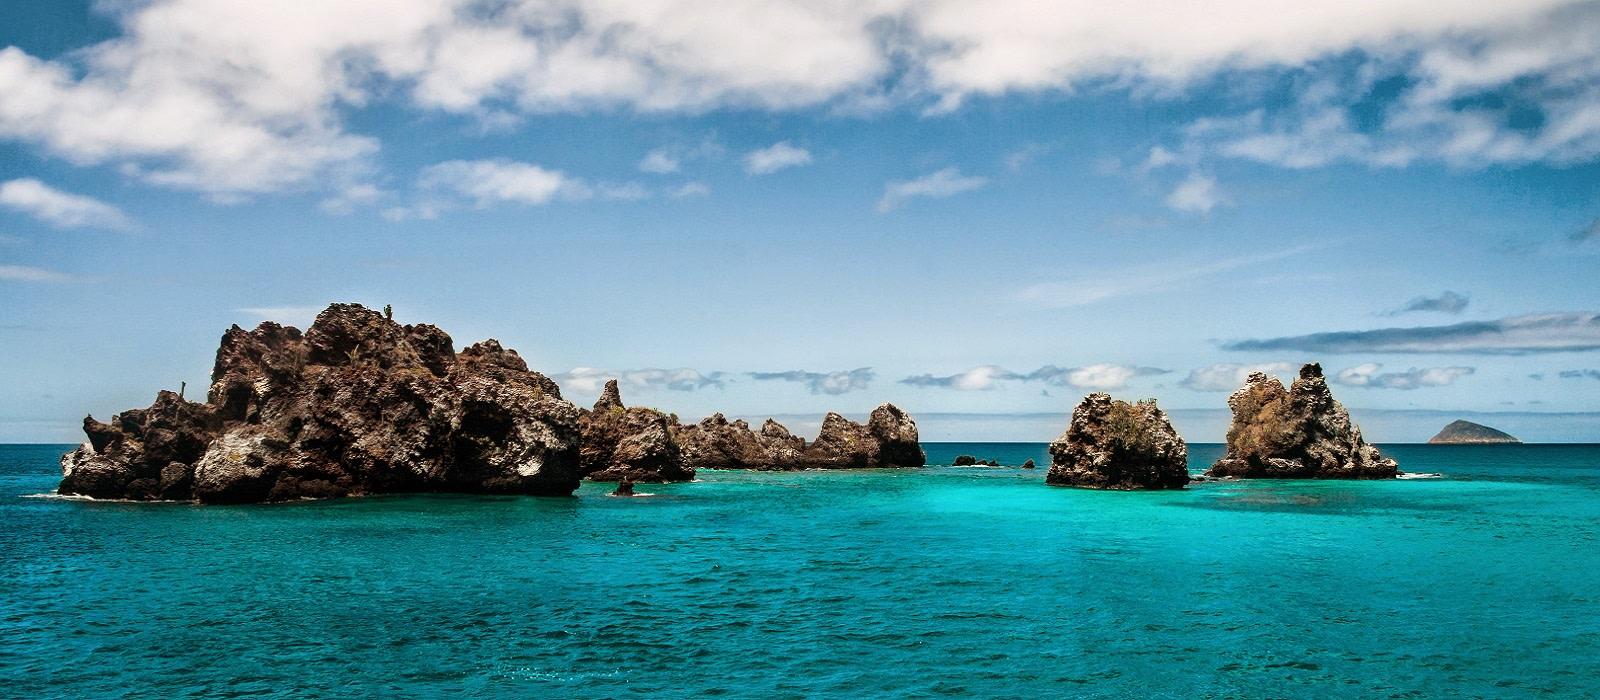 Ecuador: Galapagos, Traditions and Chocolate Tour Trip 1